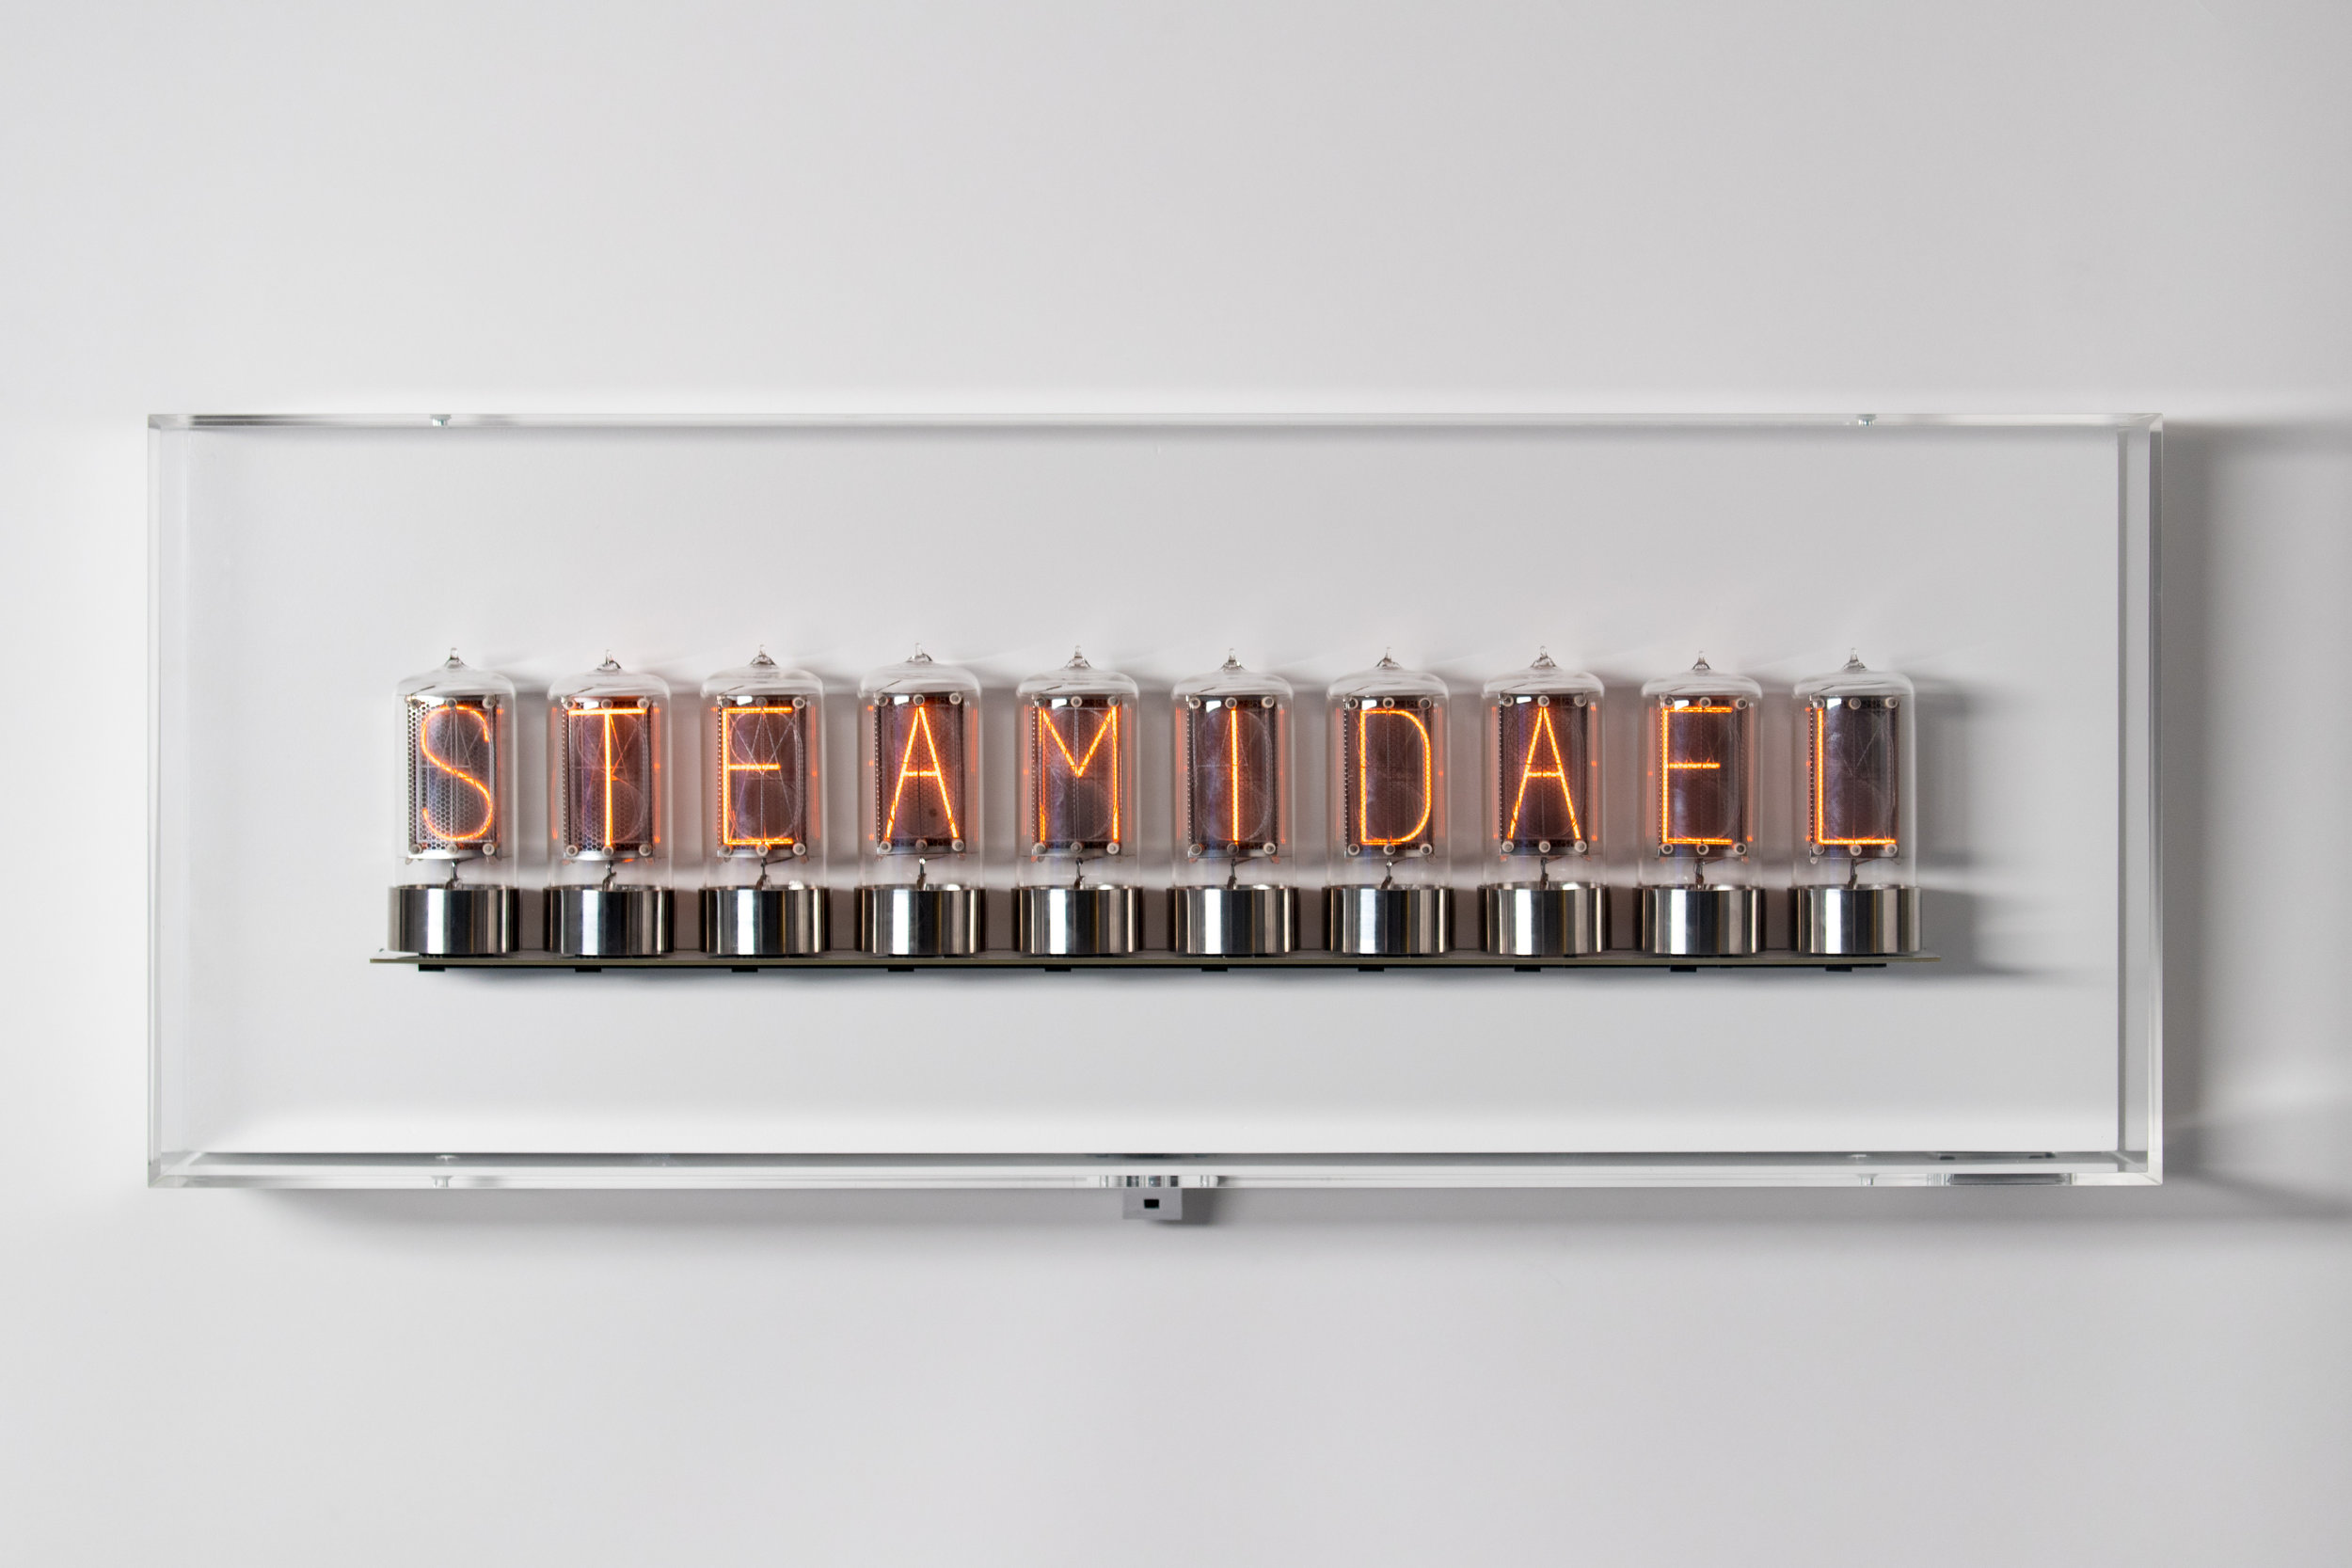 Dominic Harris, Simulated (10), 2017 8 + 2AP + 2P,Blown glass, stainless steel, acid-etched cathodes, dibond, aluminium, infrared acrylic, line-folded acrylic, time of flight sensors, bespoke electronics, 78 x 30 x 15 cm